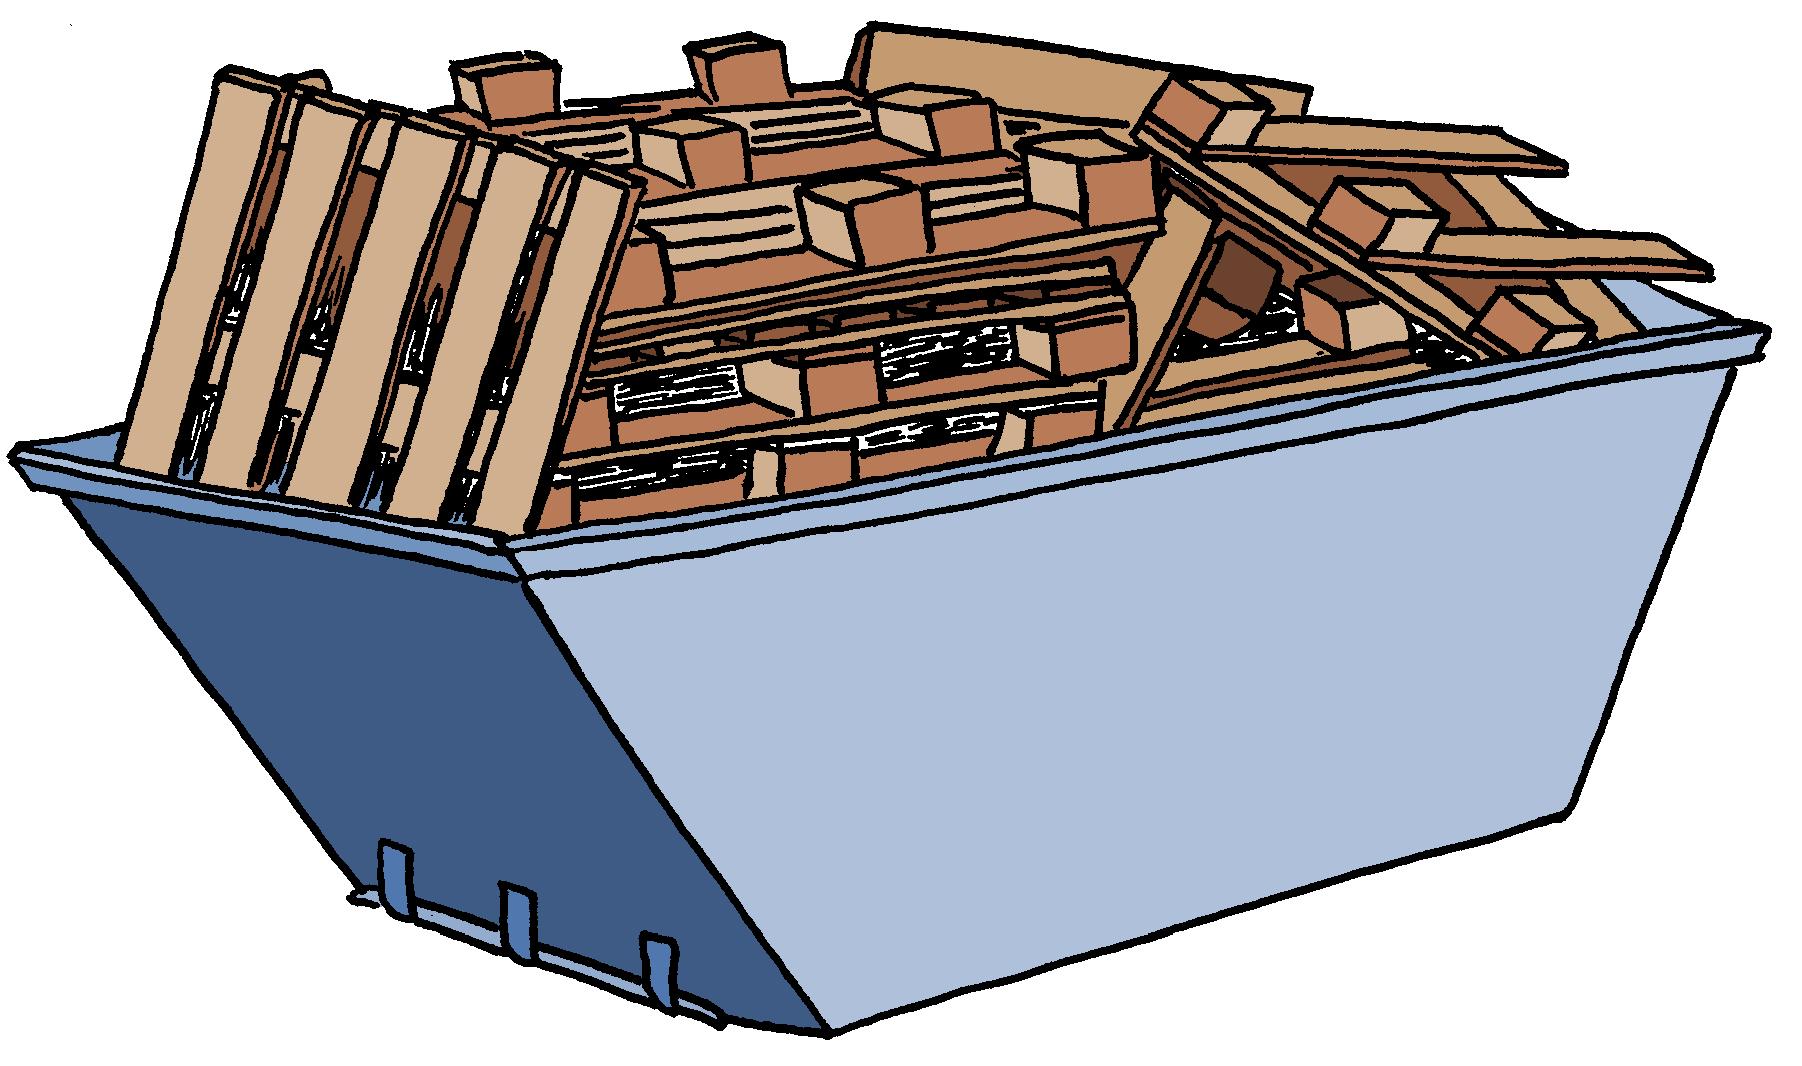 Reducing waste wood skip charges.